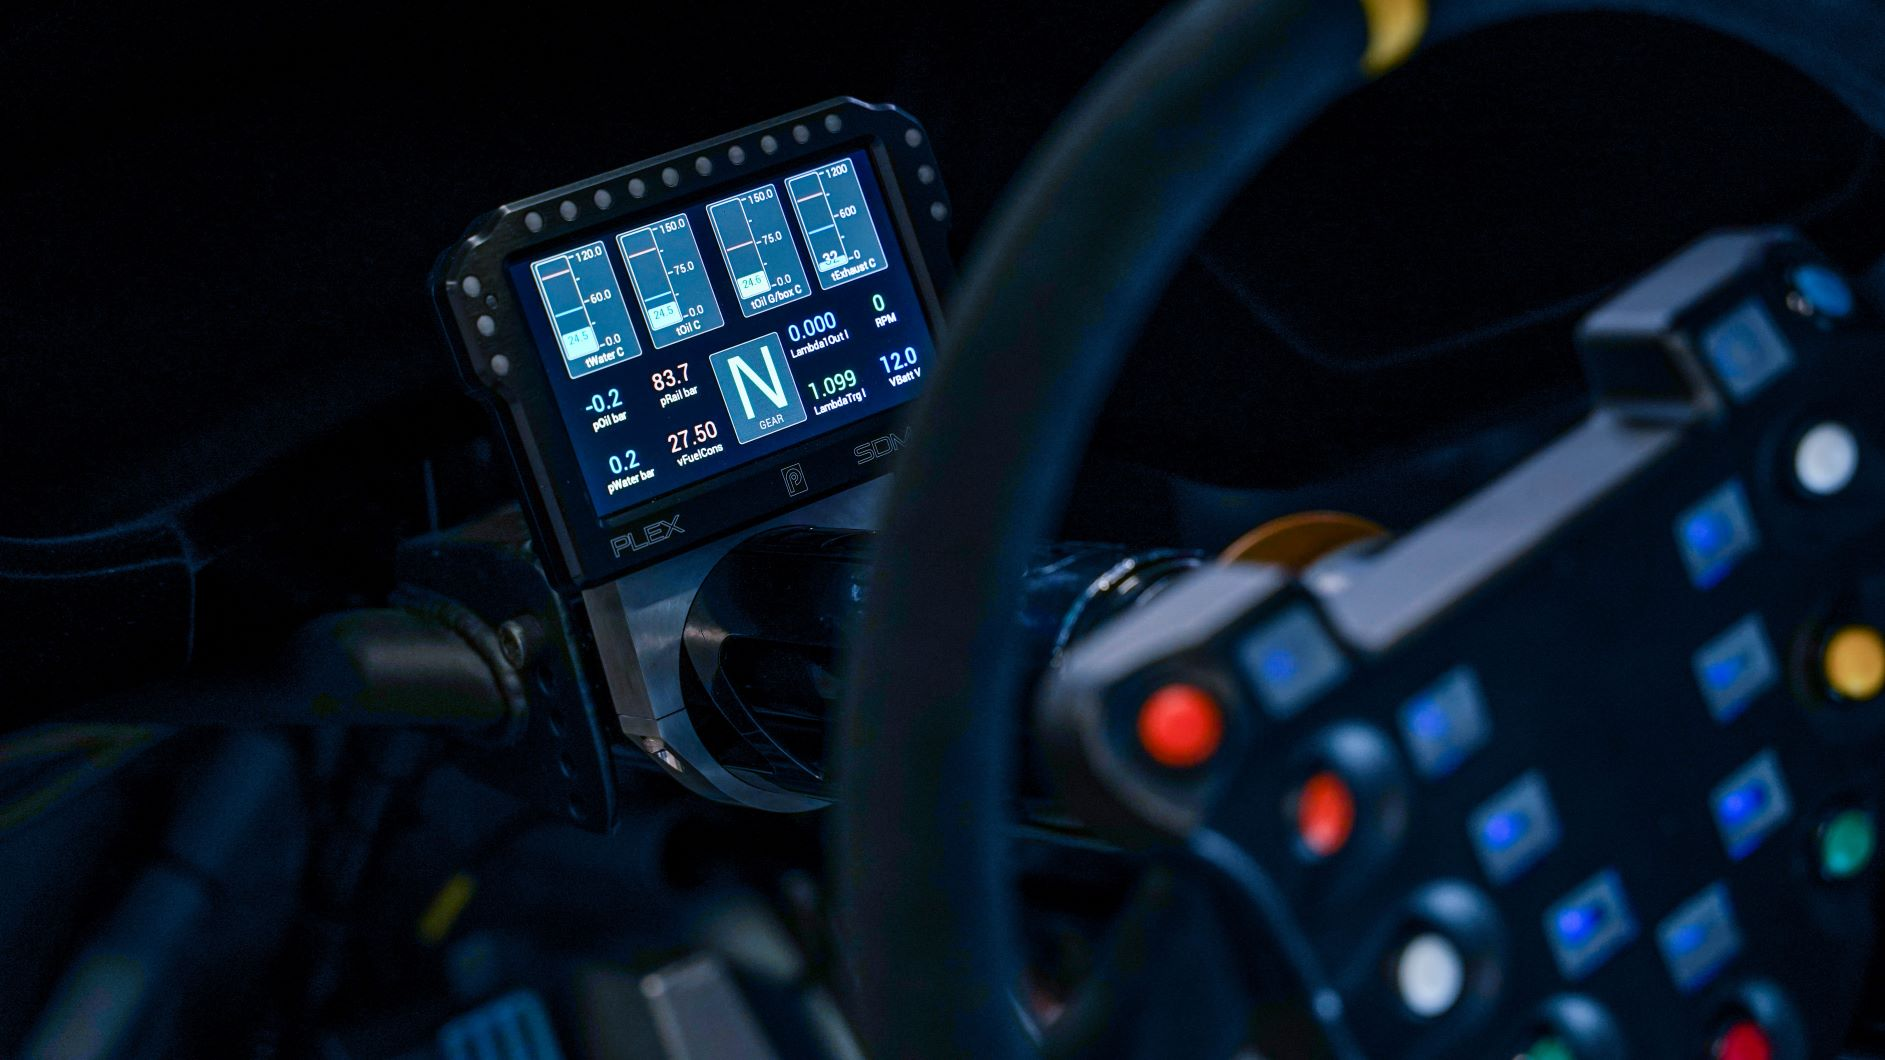 Plex Tuning SDM 550 datalogger, FIA R4 motorpsort electronics supplied by Longman Racing